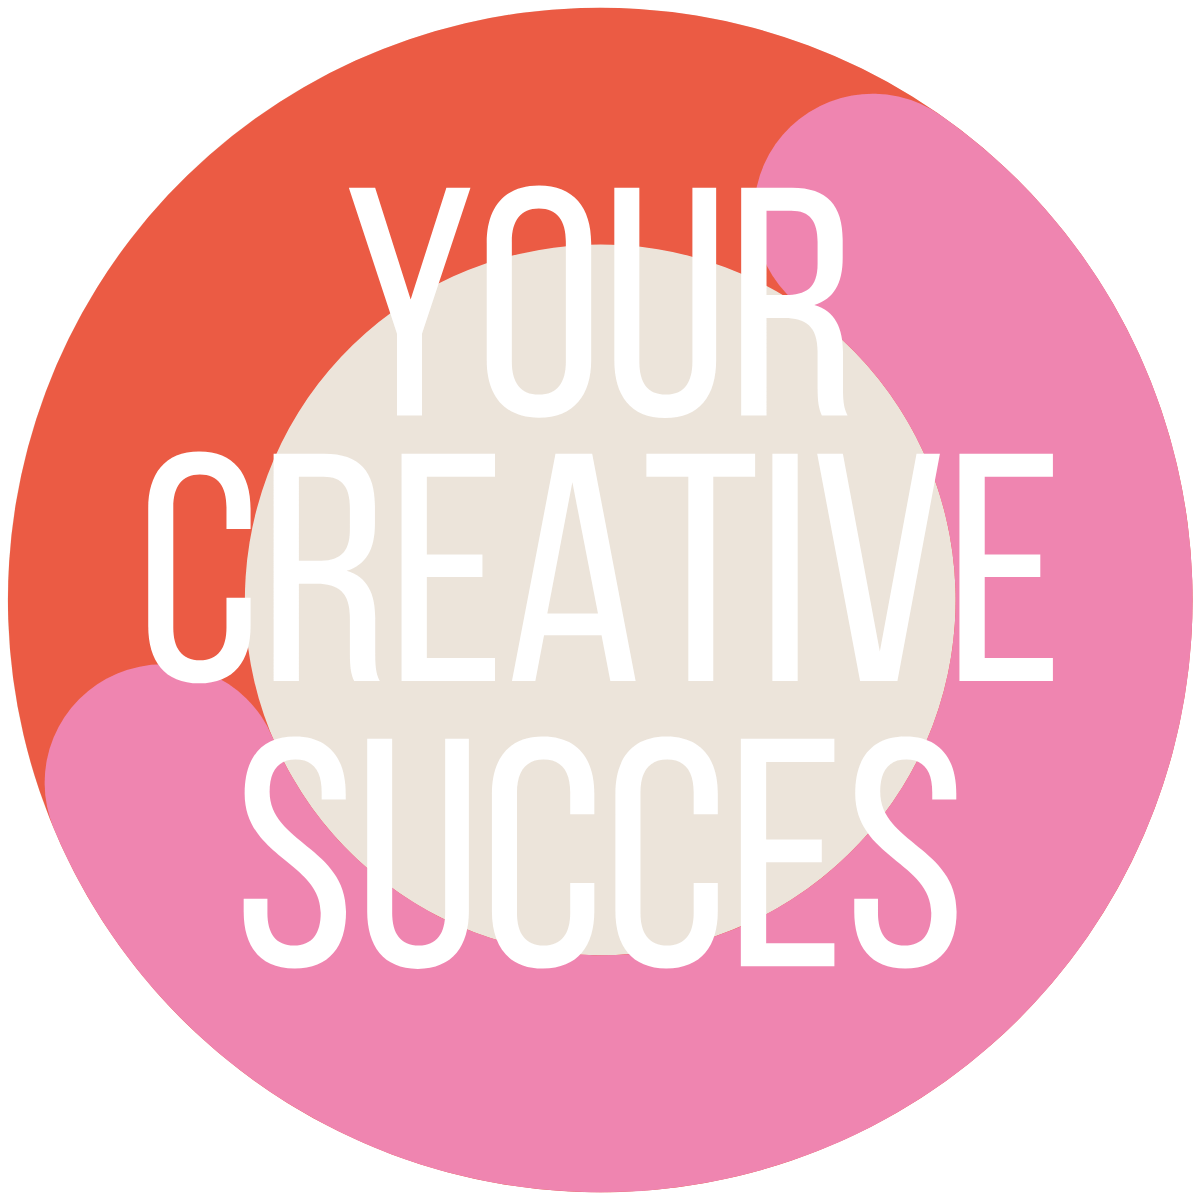 your creative success